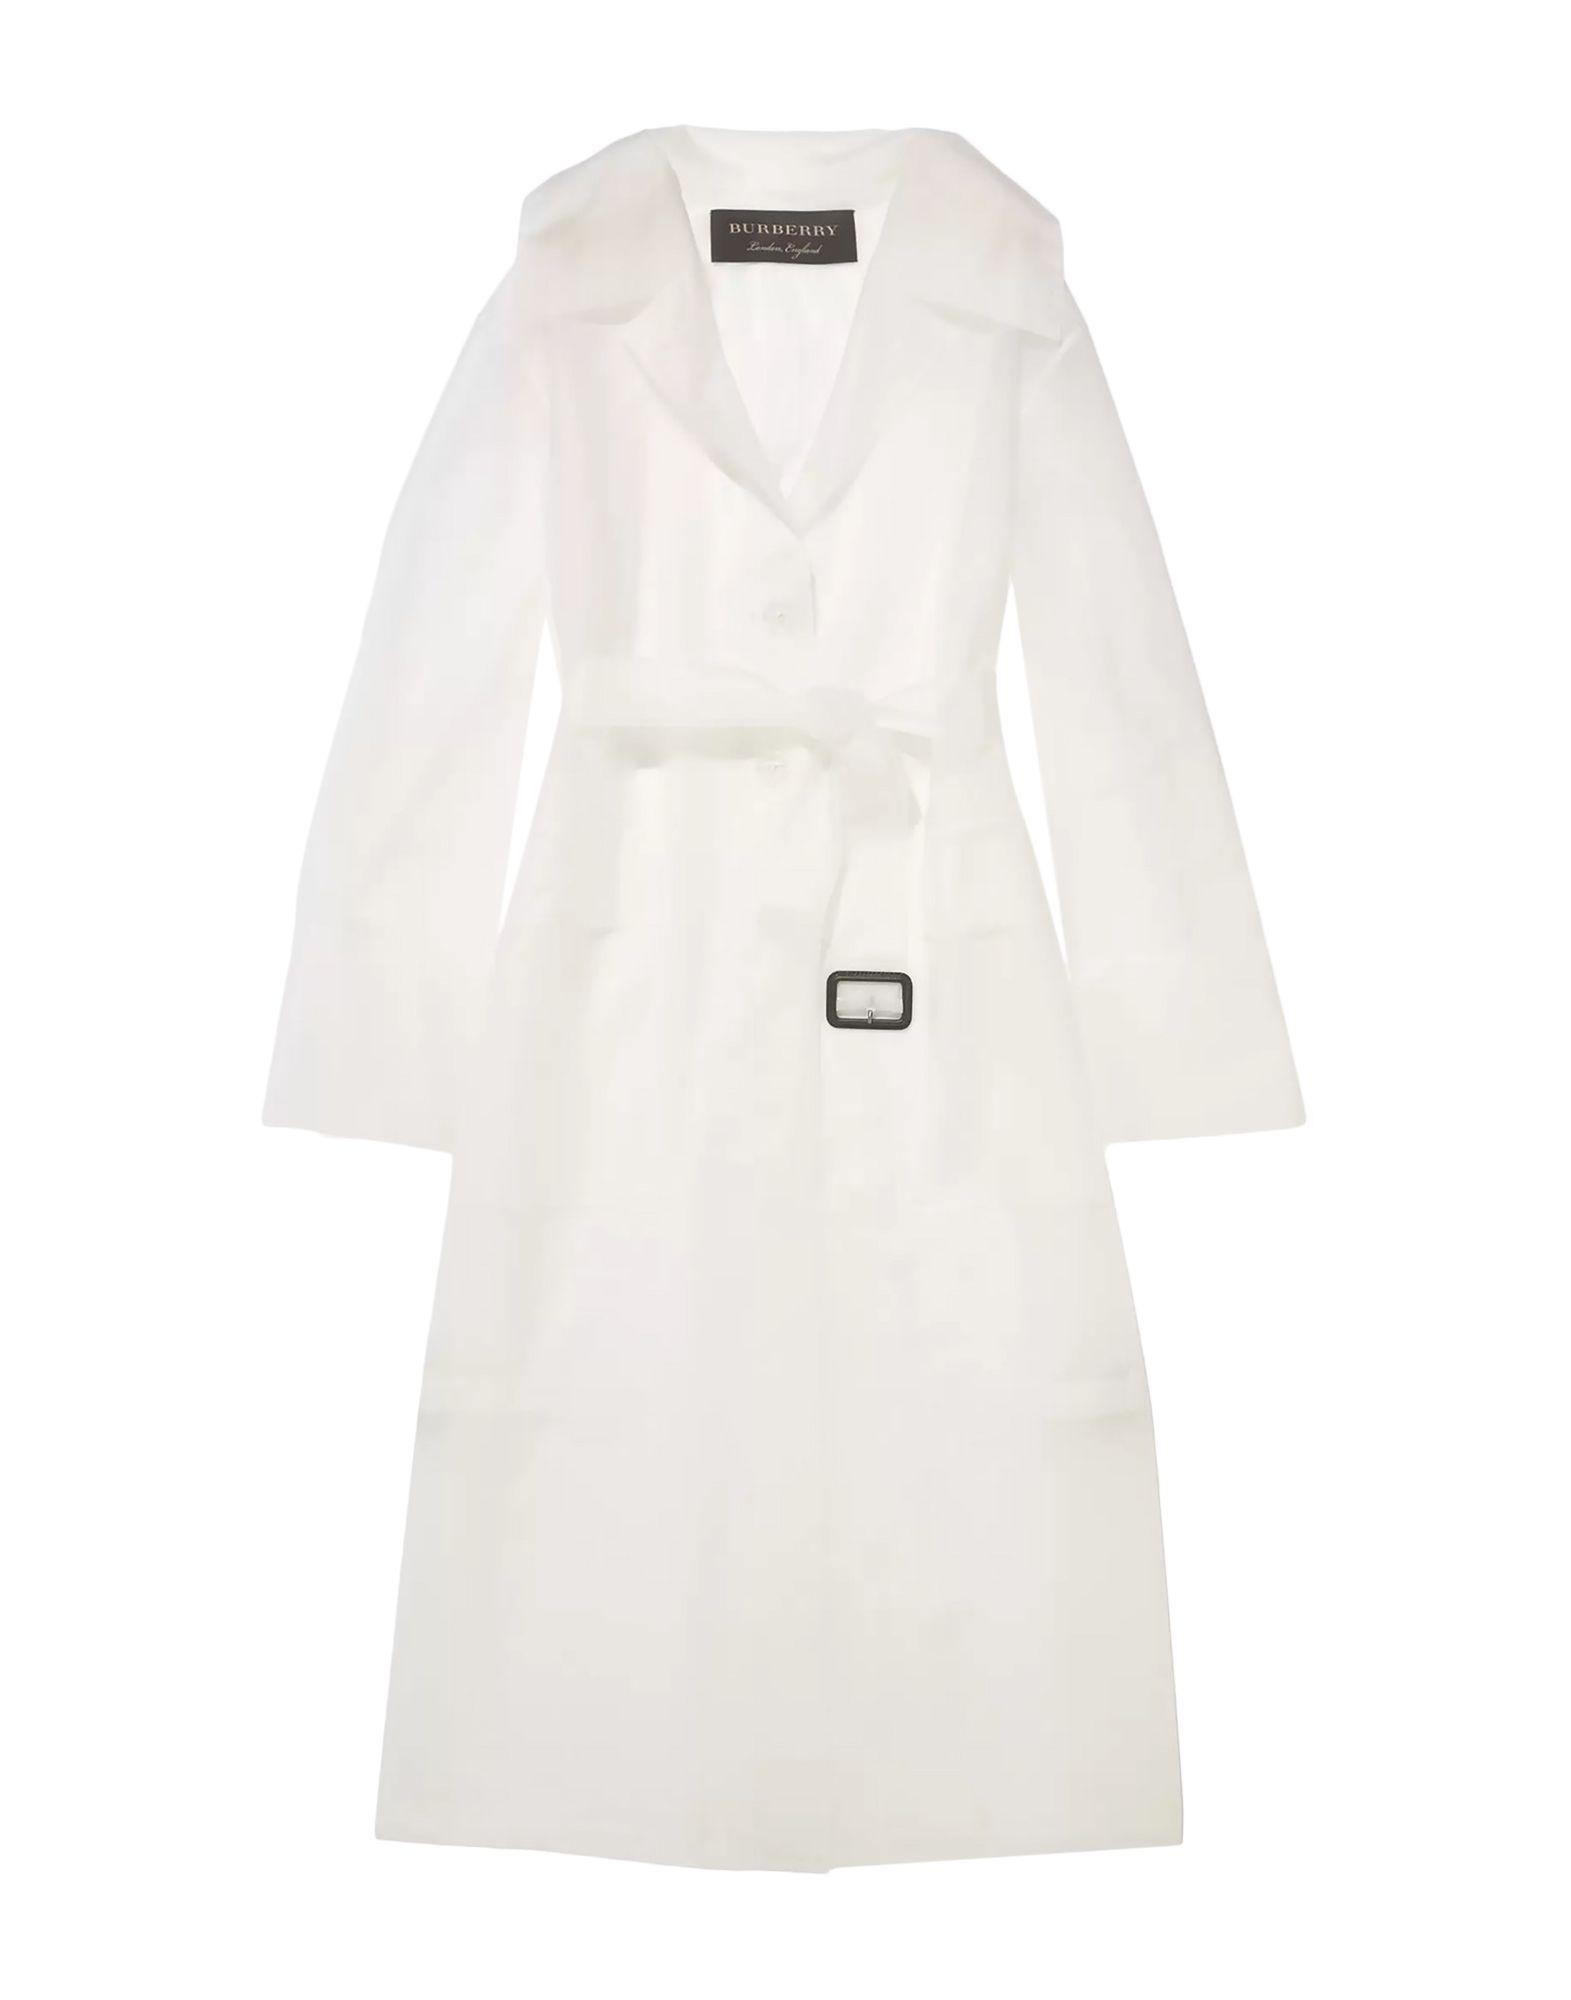 BURBERRY Overcoats - Item 41939261